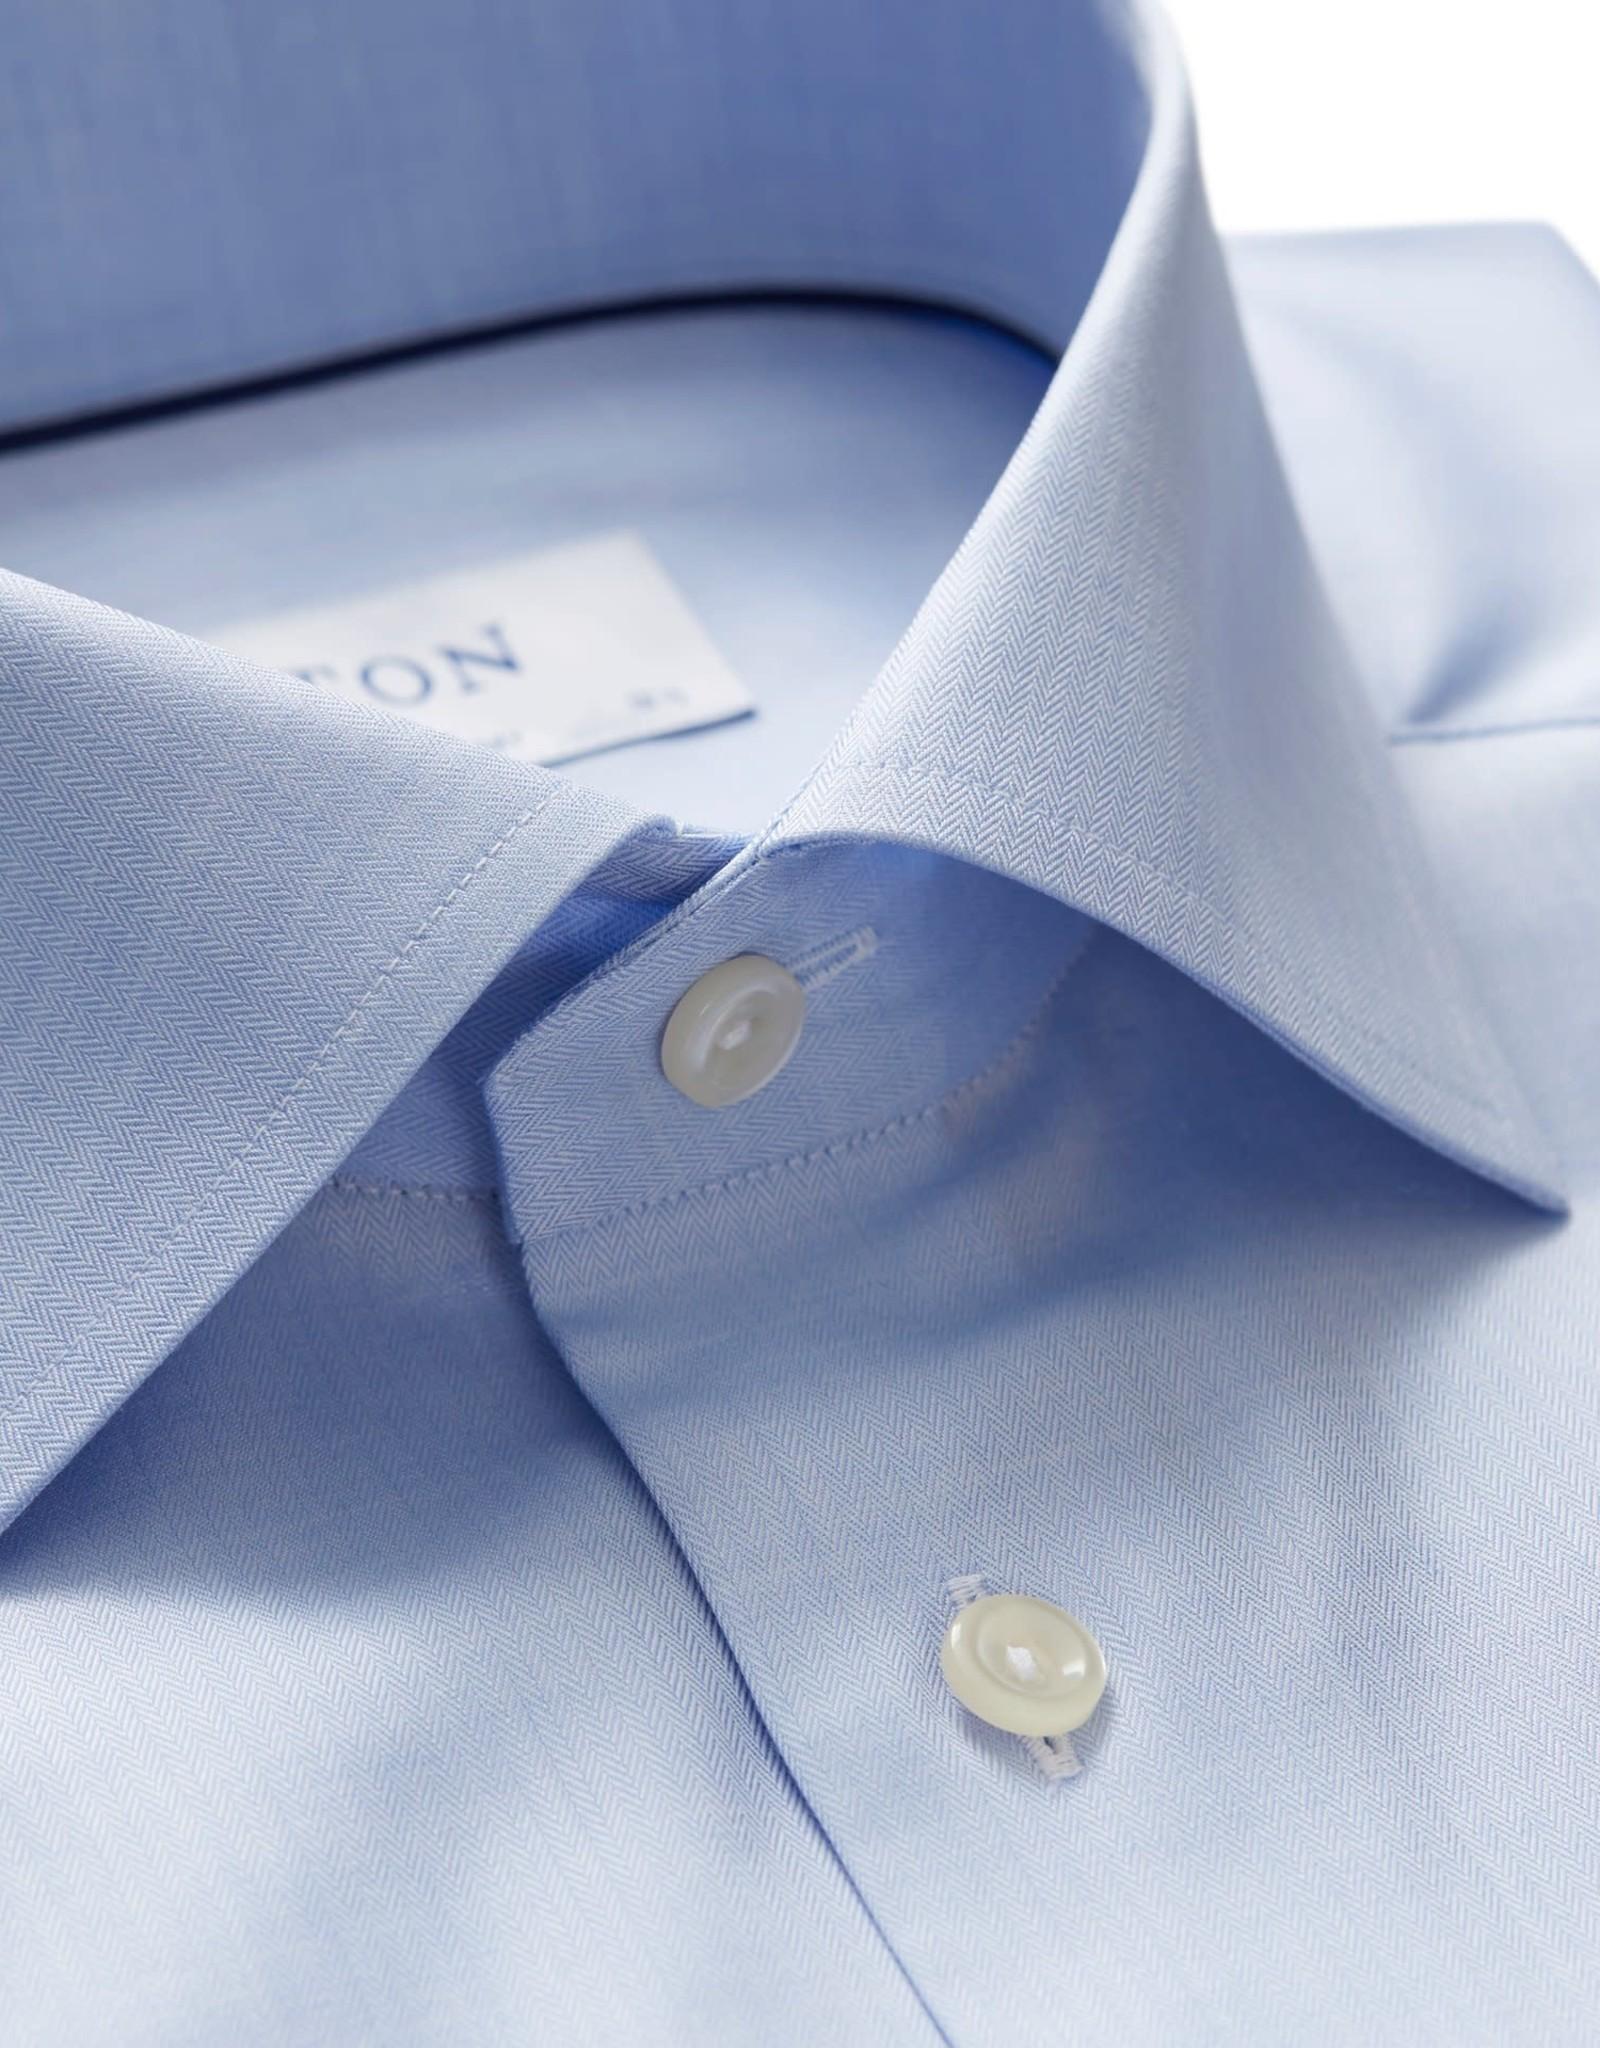 Eton Eton hemd blauw contemporary 3072-79311/20